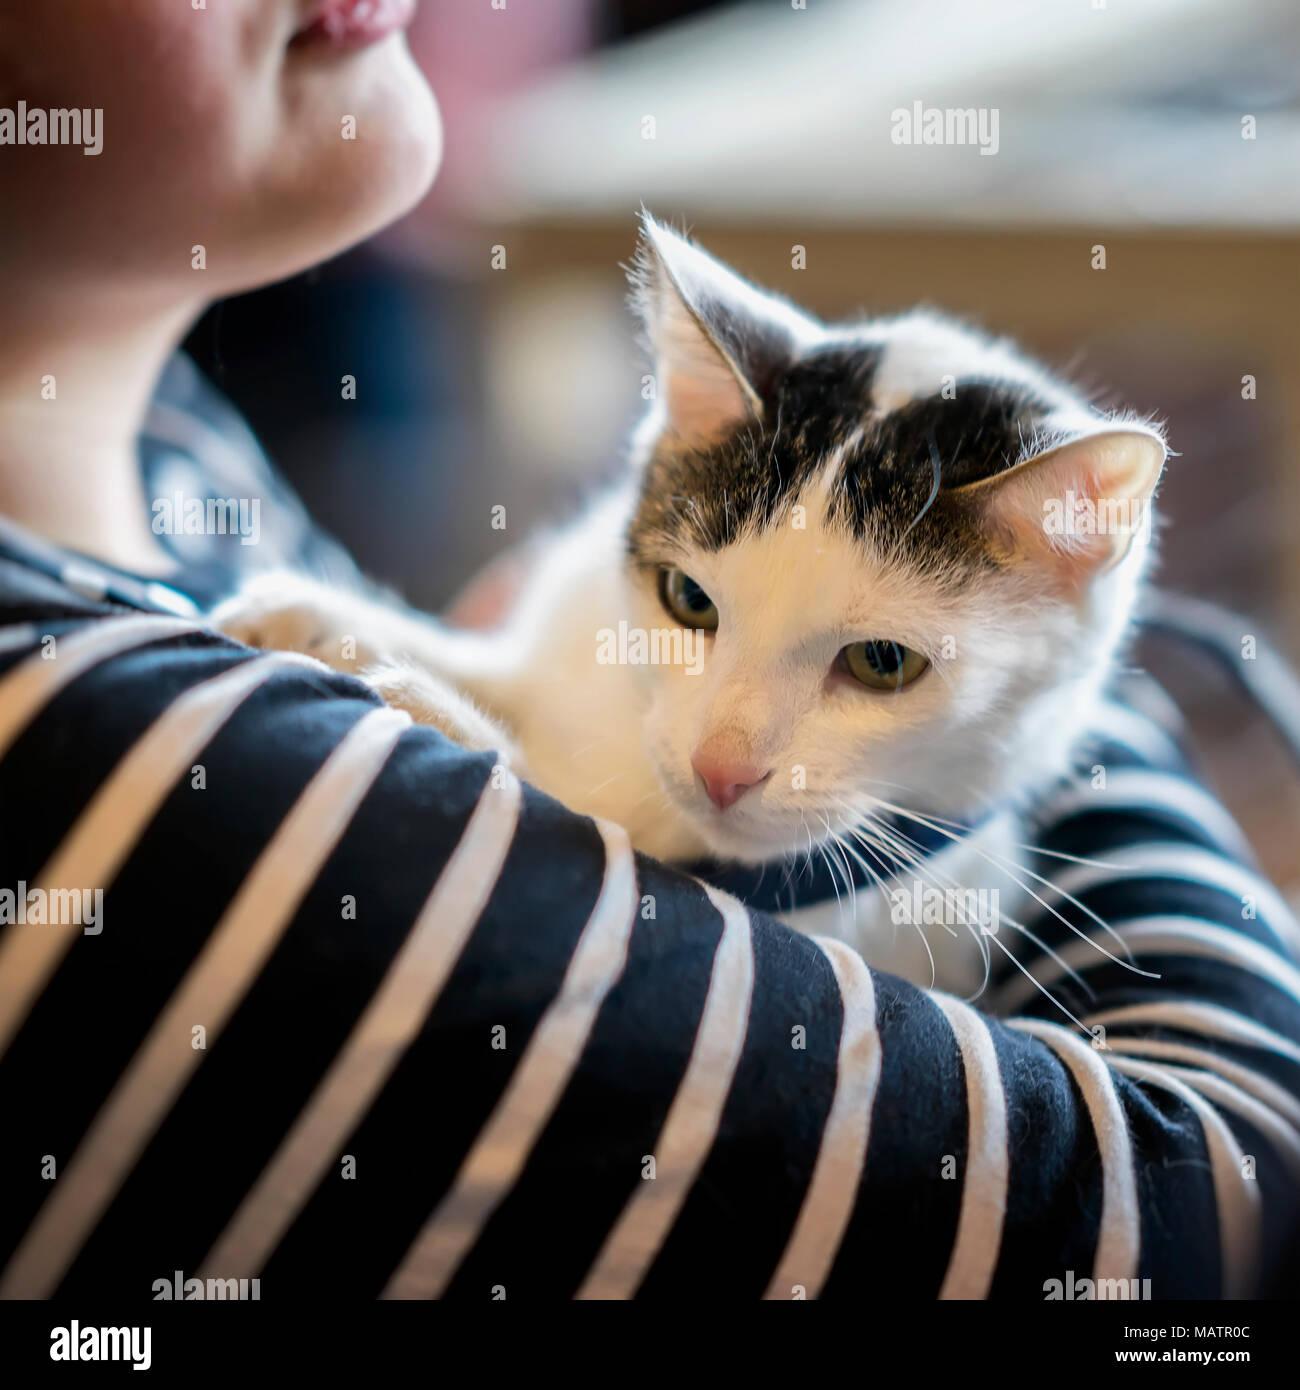 Frightened kitten in hands of girl volunteer, in shelter for homeless animals. Kitten will have home, girl takes cat to her home - Stock Image